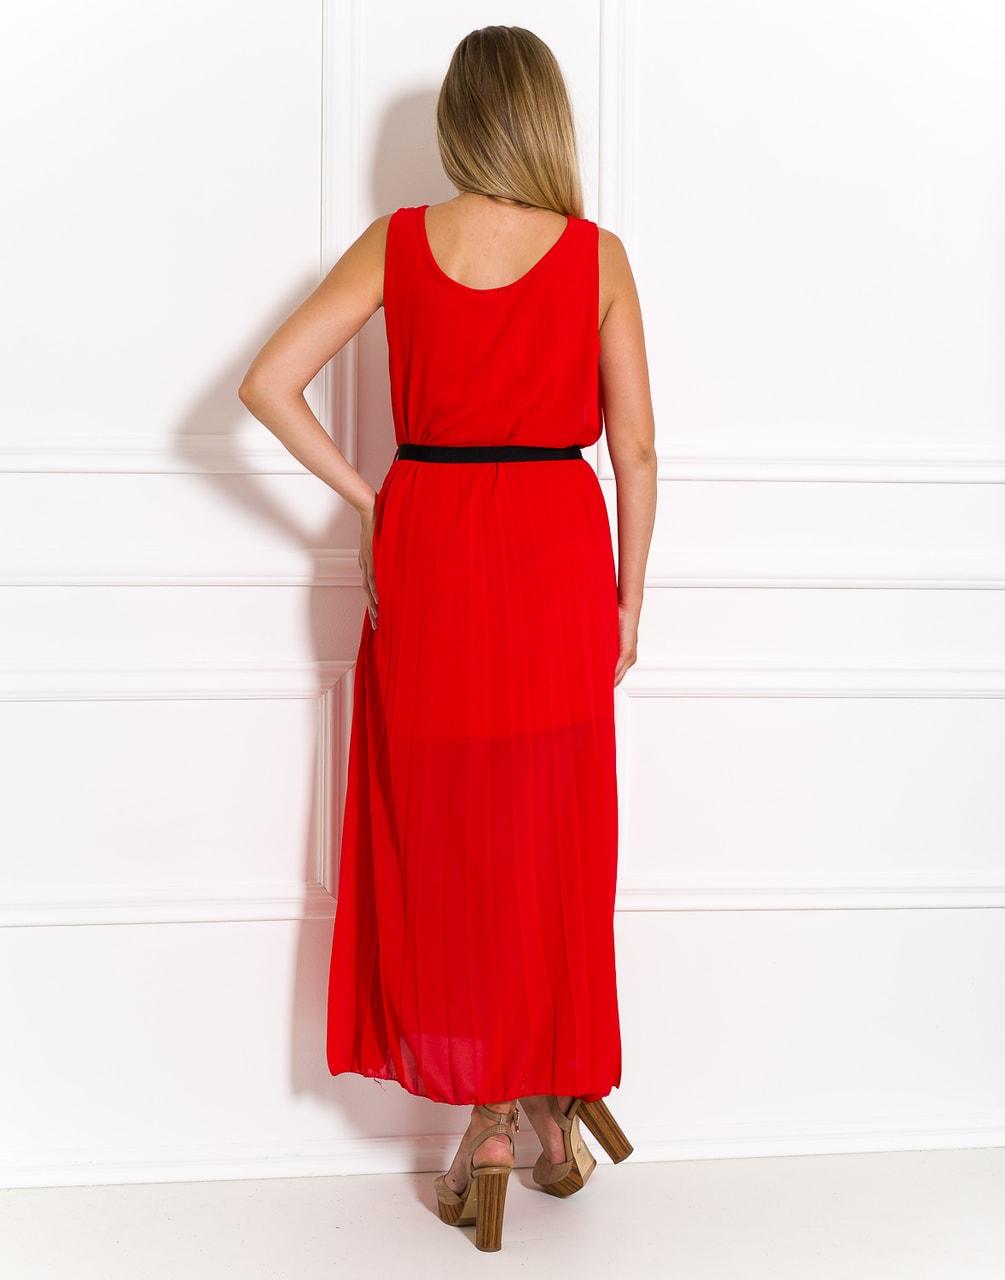 Glamadise.sk - Dlhé šaty červené plisované - Glamorous by Glam ... 57523123771